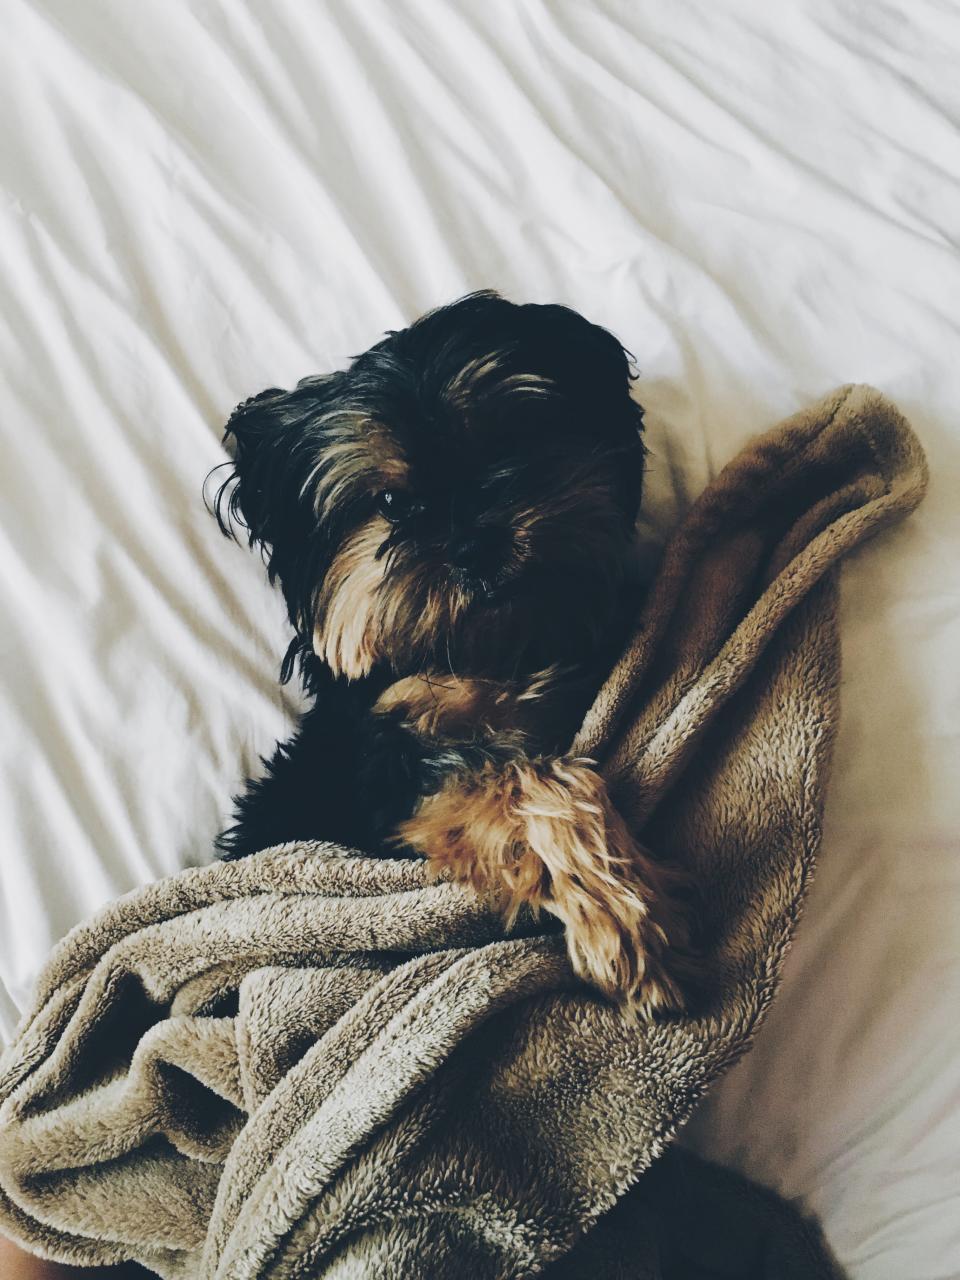 black, dog, puppy, animal, pet, bed, sheet, blanket